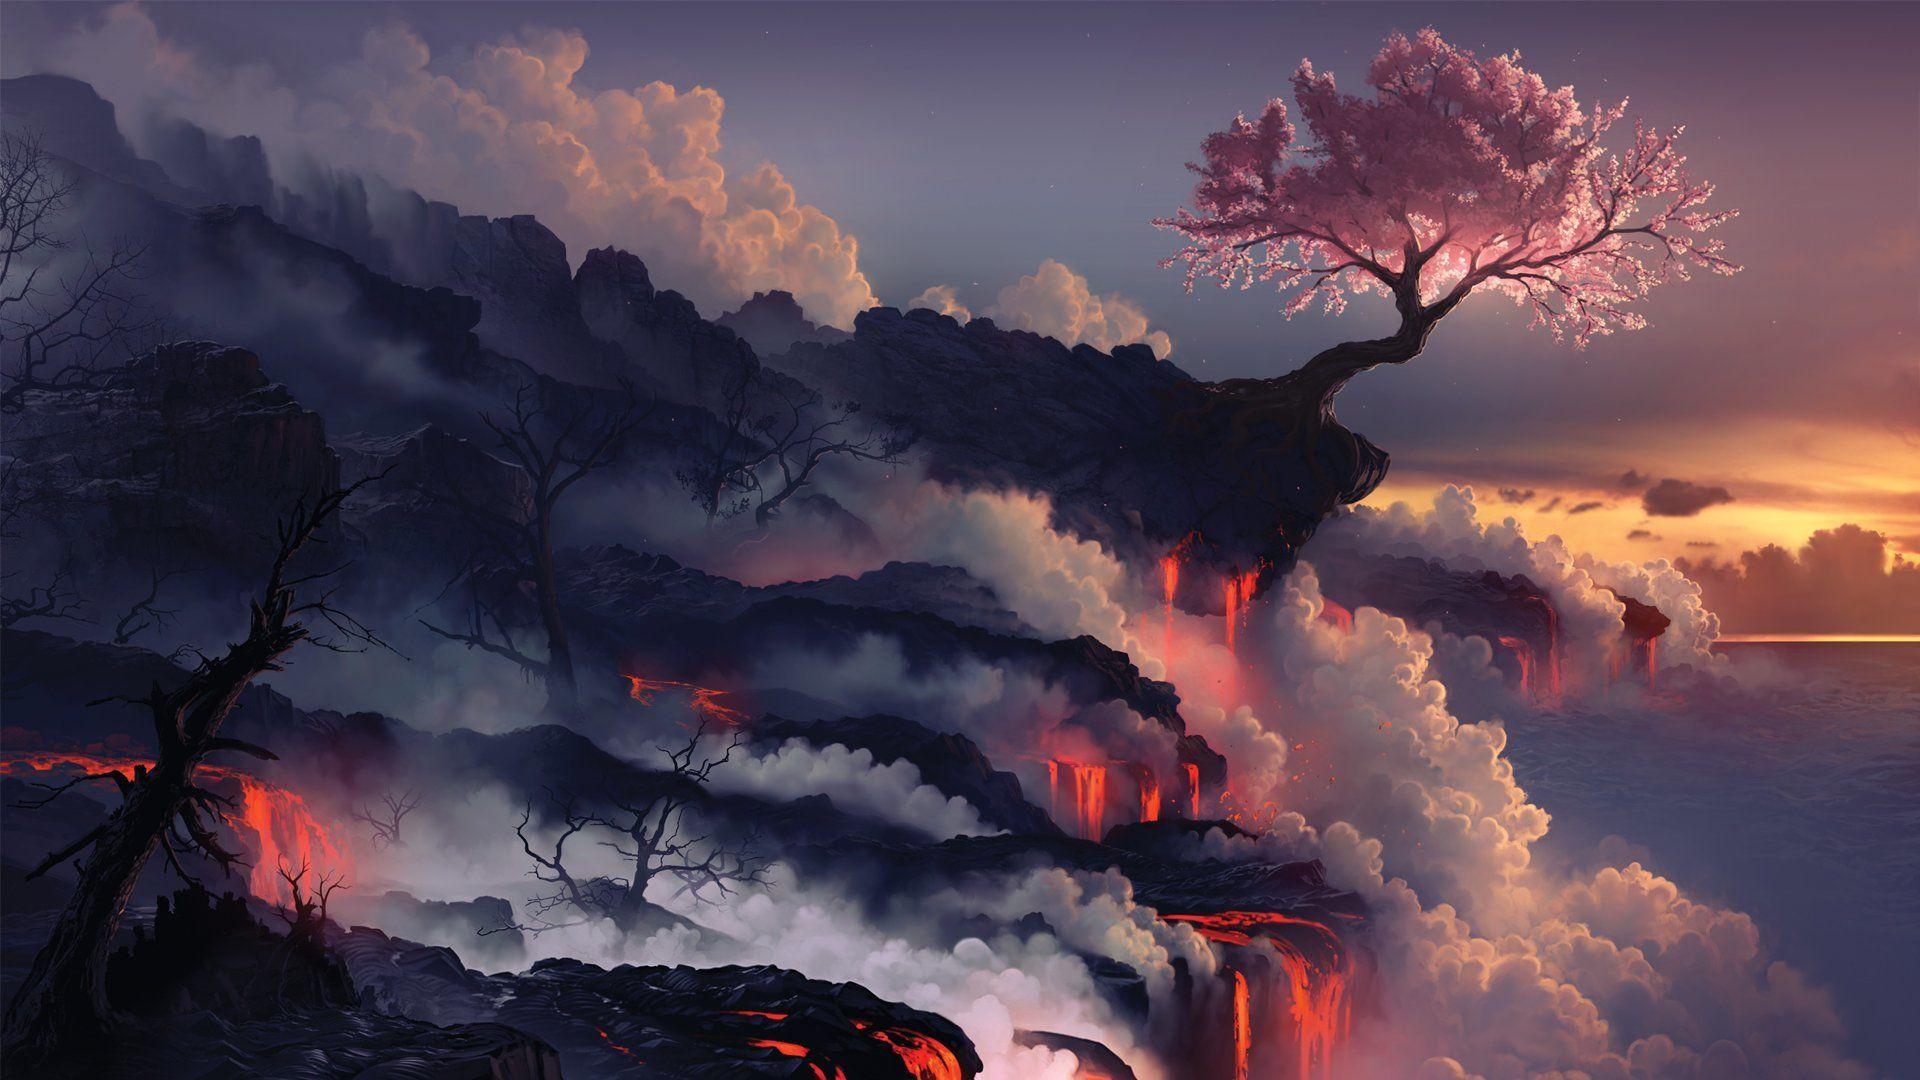 Epic Fantasy Wallpaper Full Hd On Wallpaper 1080p Hd Landscape Wallpaper Volcano Wallpaper Fantasy Landscape